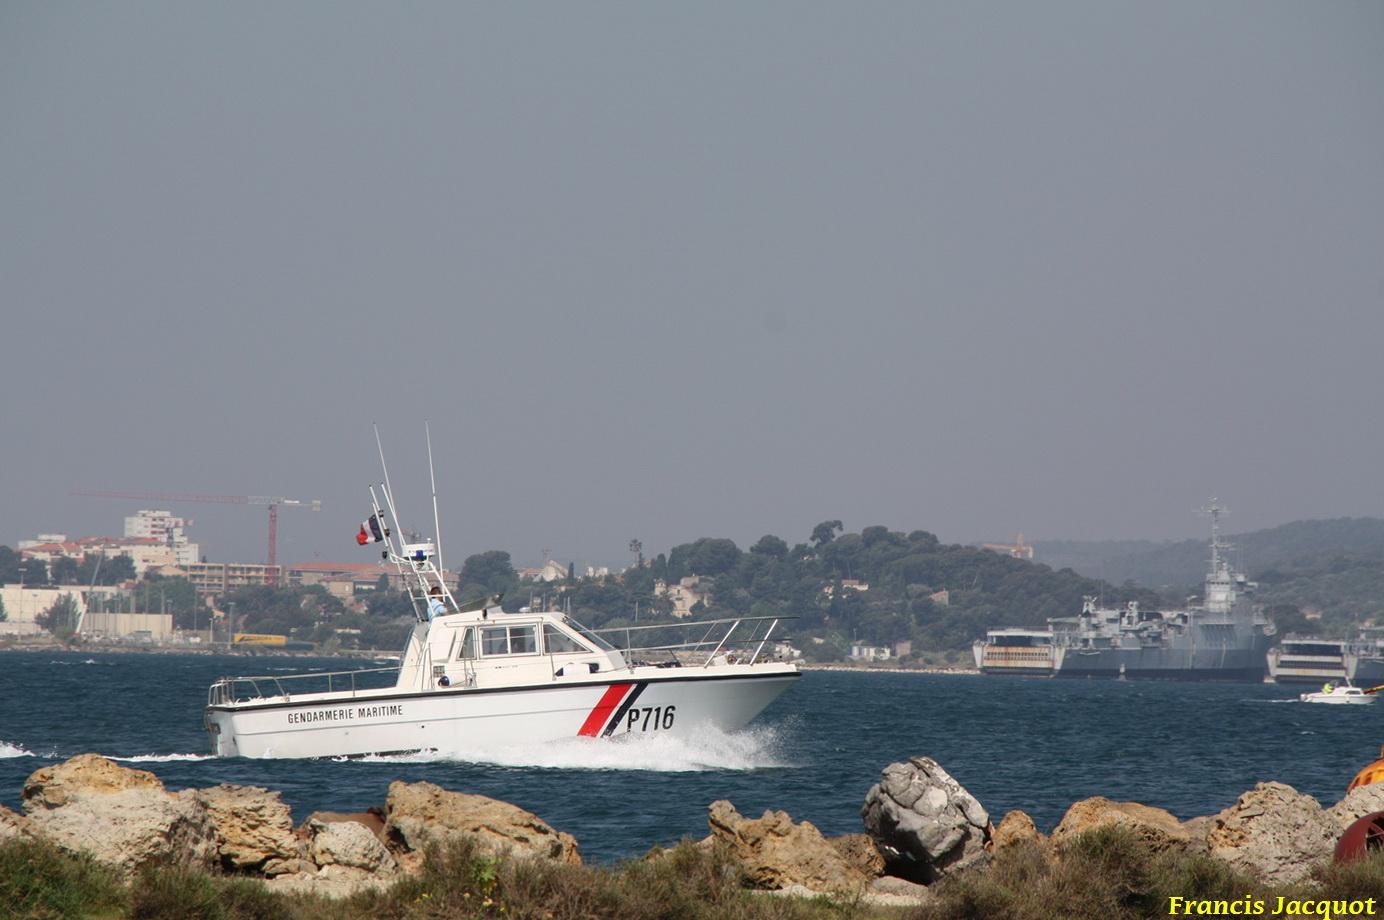 [ Divers Gendarmerie Maritime ] La Gendarmerie Maritime d'Aujourd'hui - Page 2 Img_6510